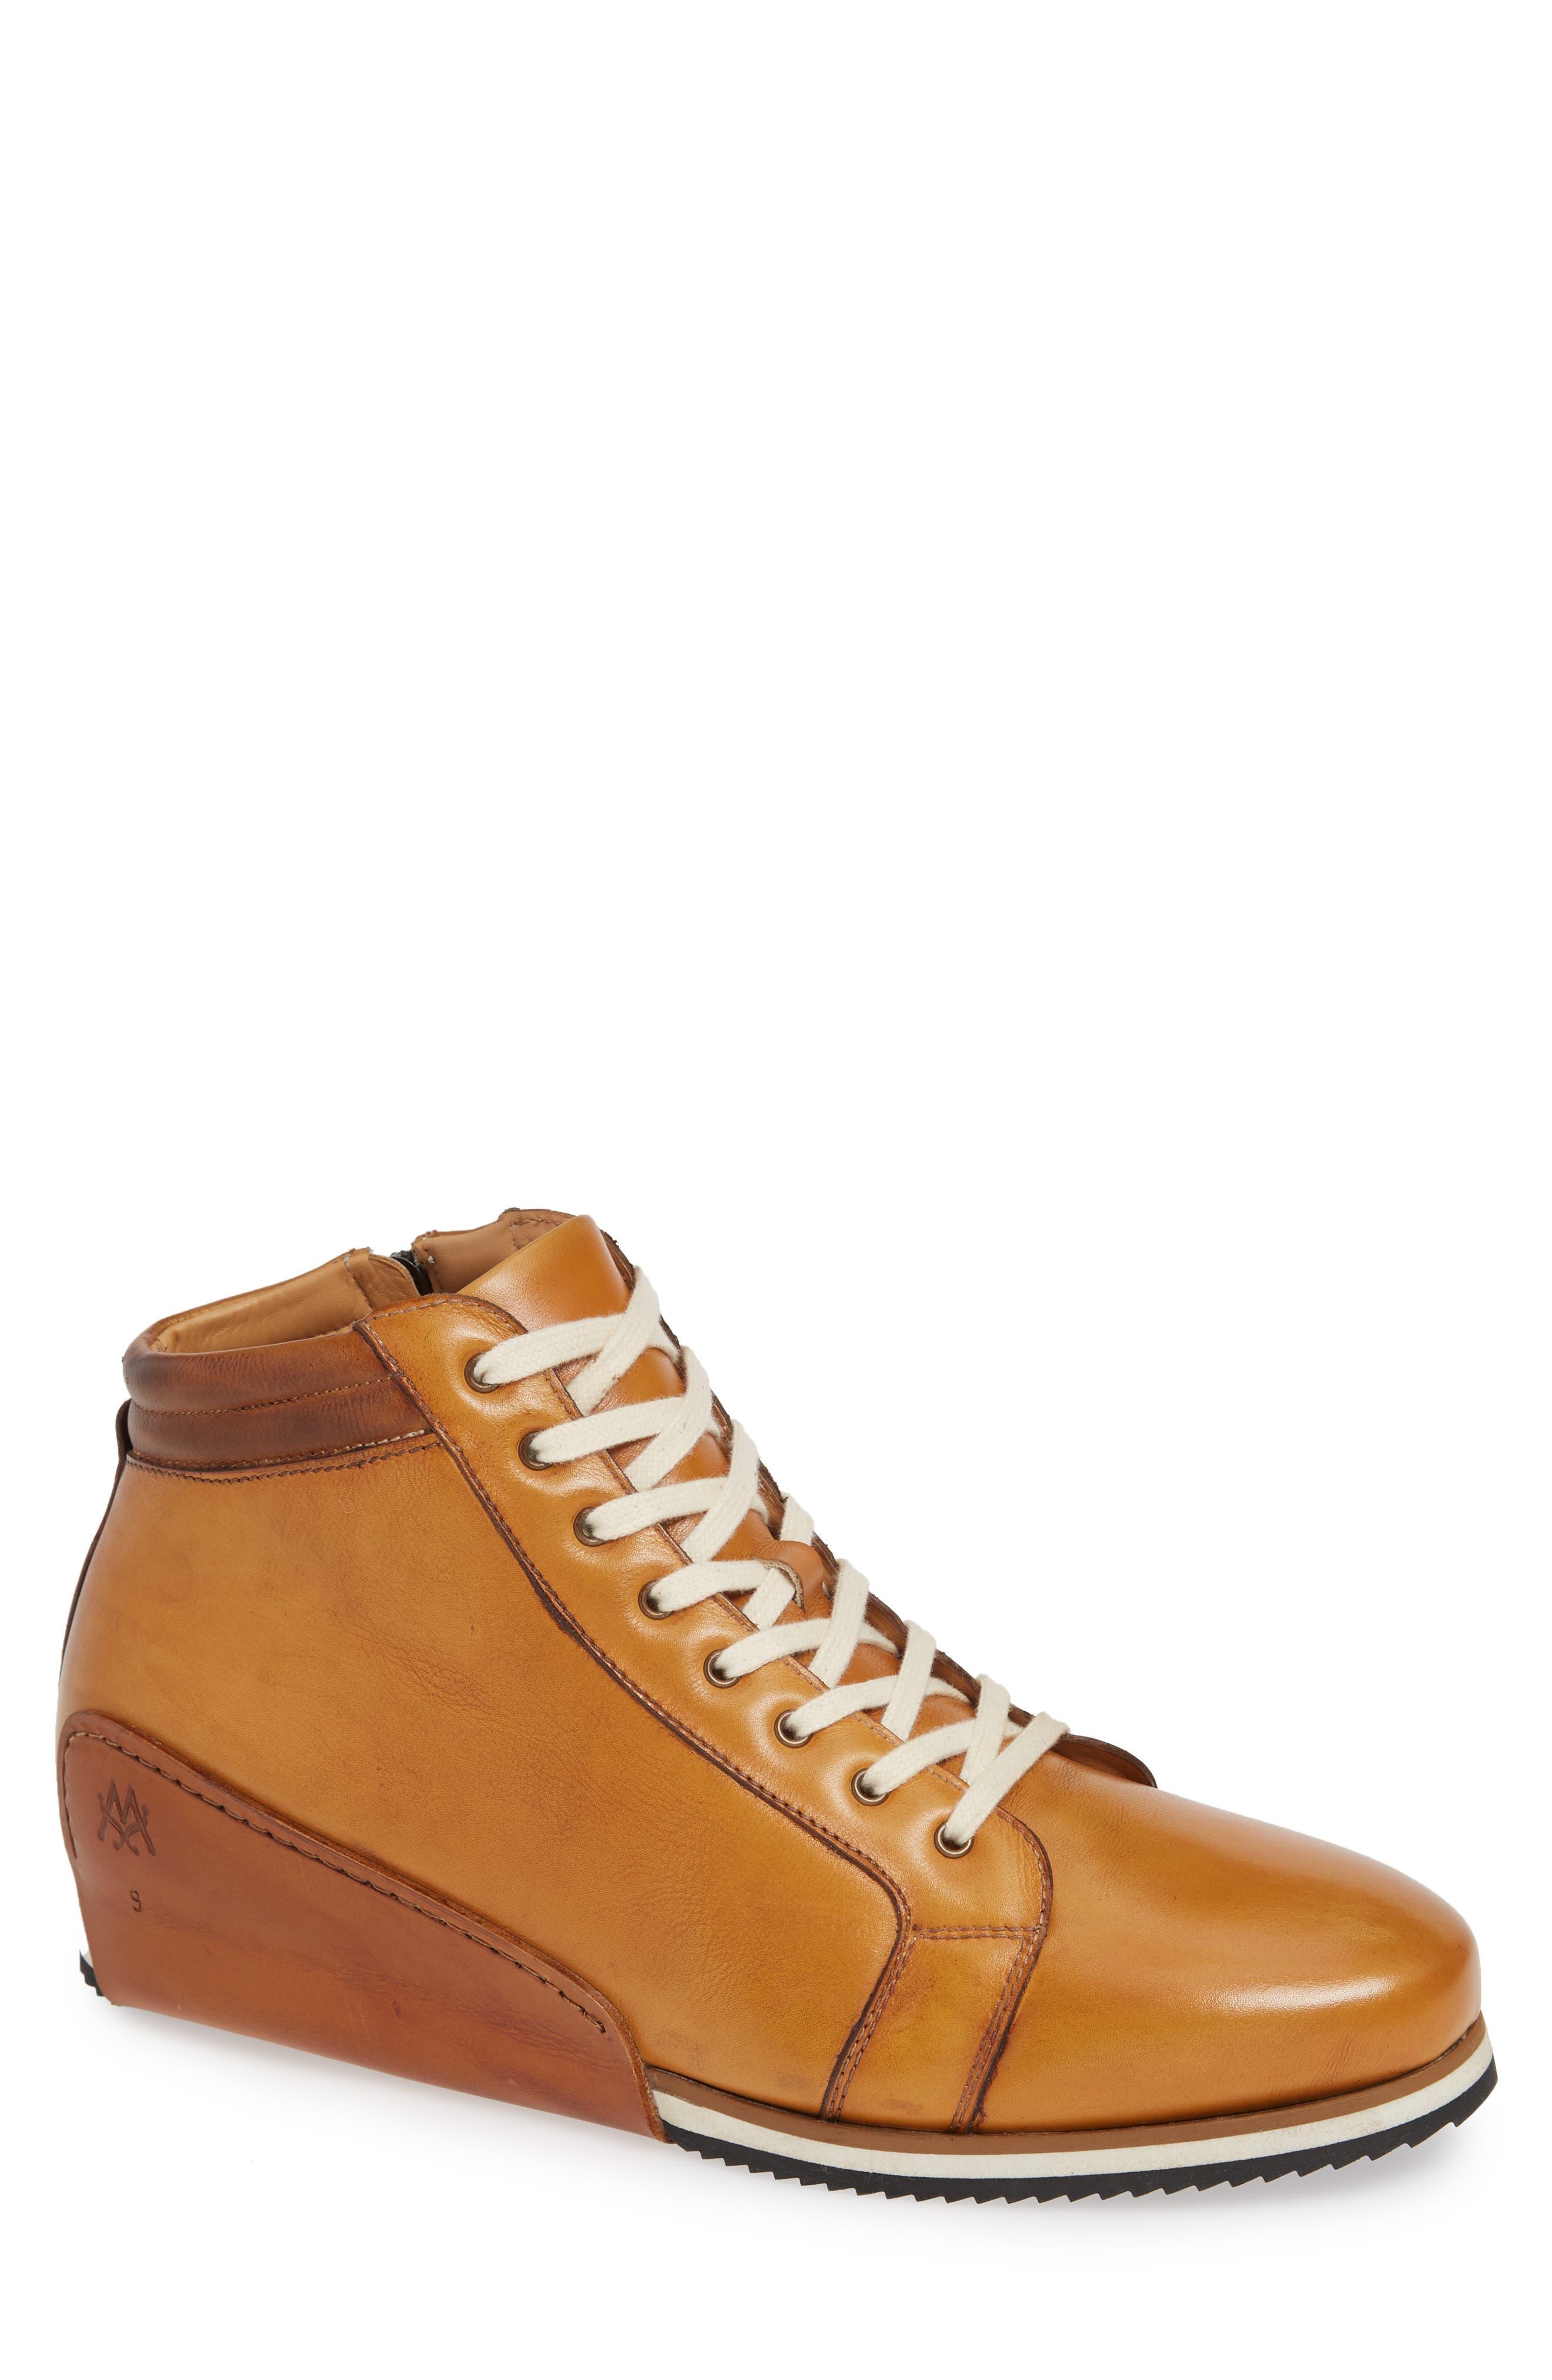 Niro Sneaker,                             Main thumbnail 1, color,                             TAN LEATHER